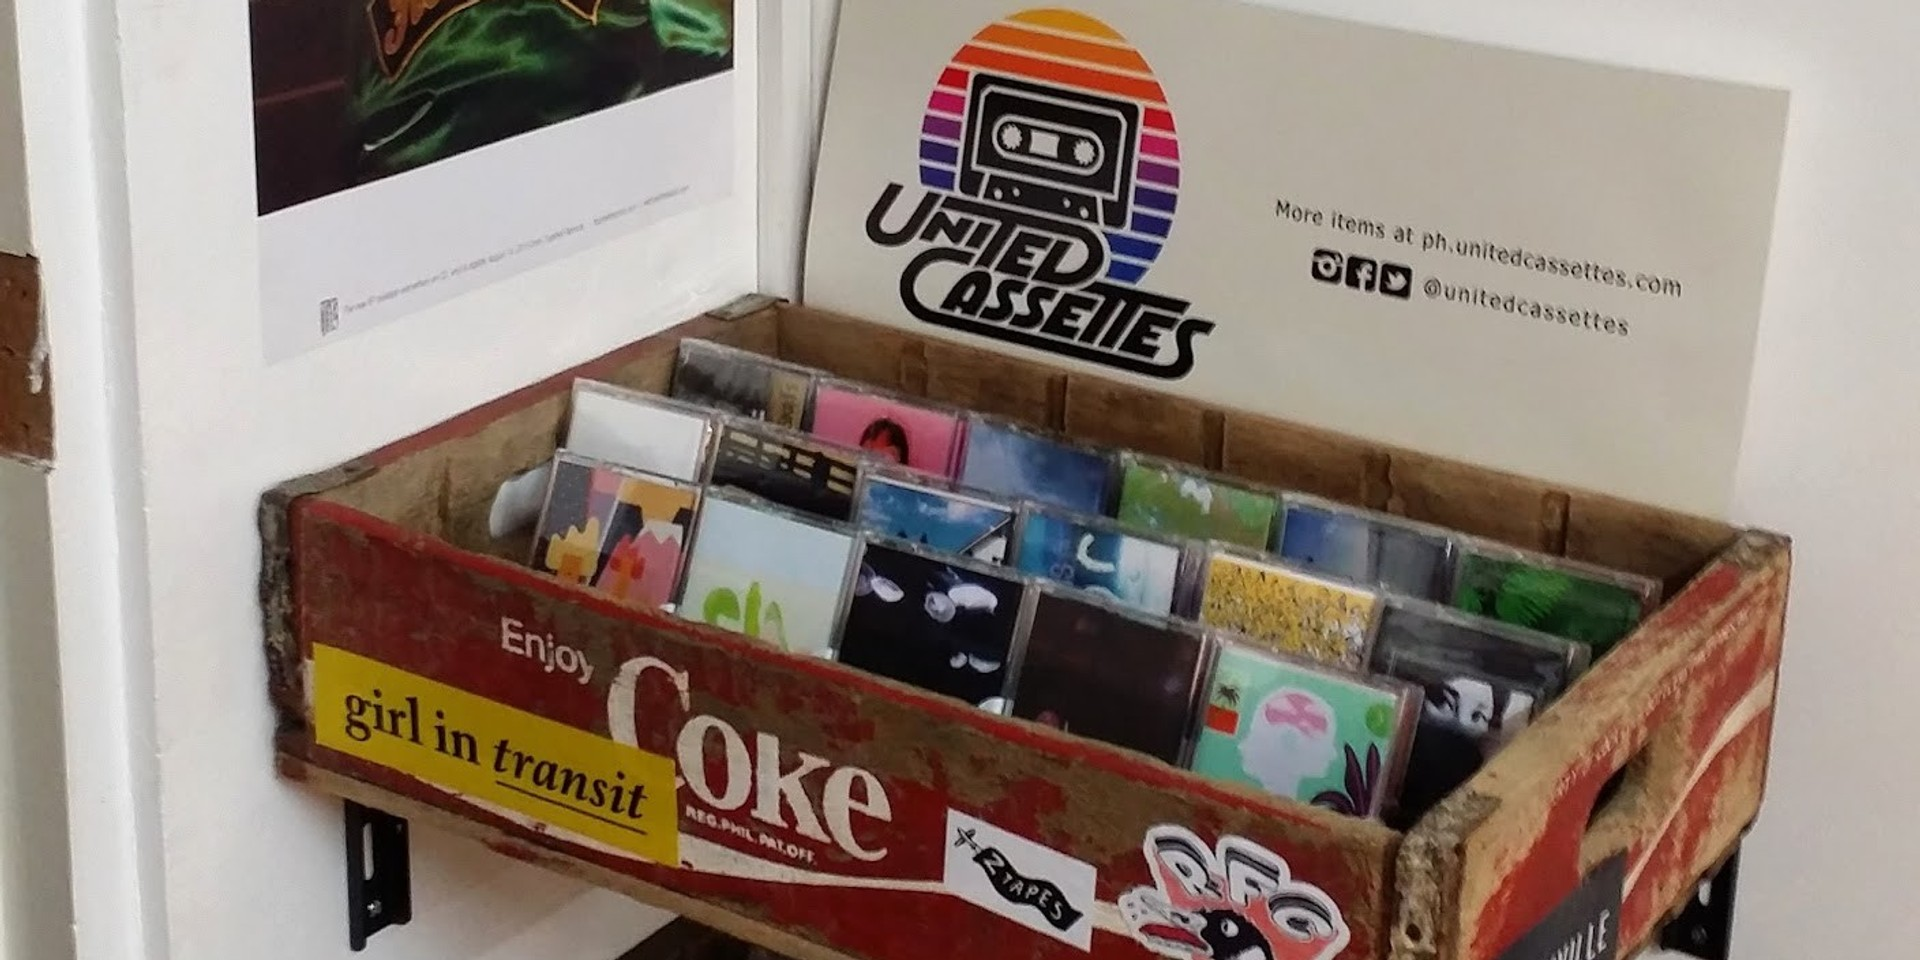 United Cassettes arrives in Manila, music curator Kurvine Chua talks cassettes and mixtapes